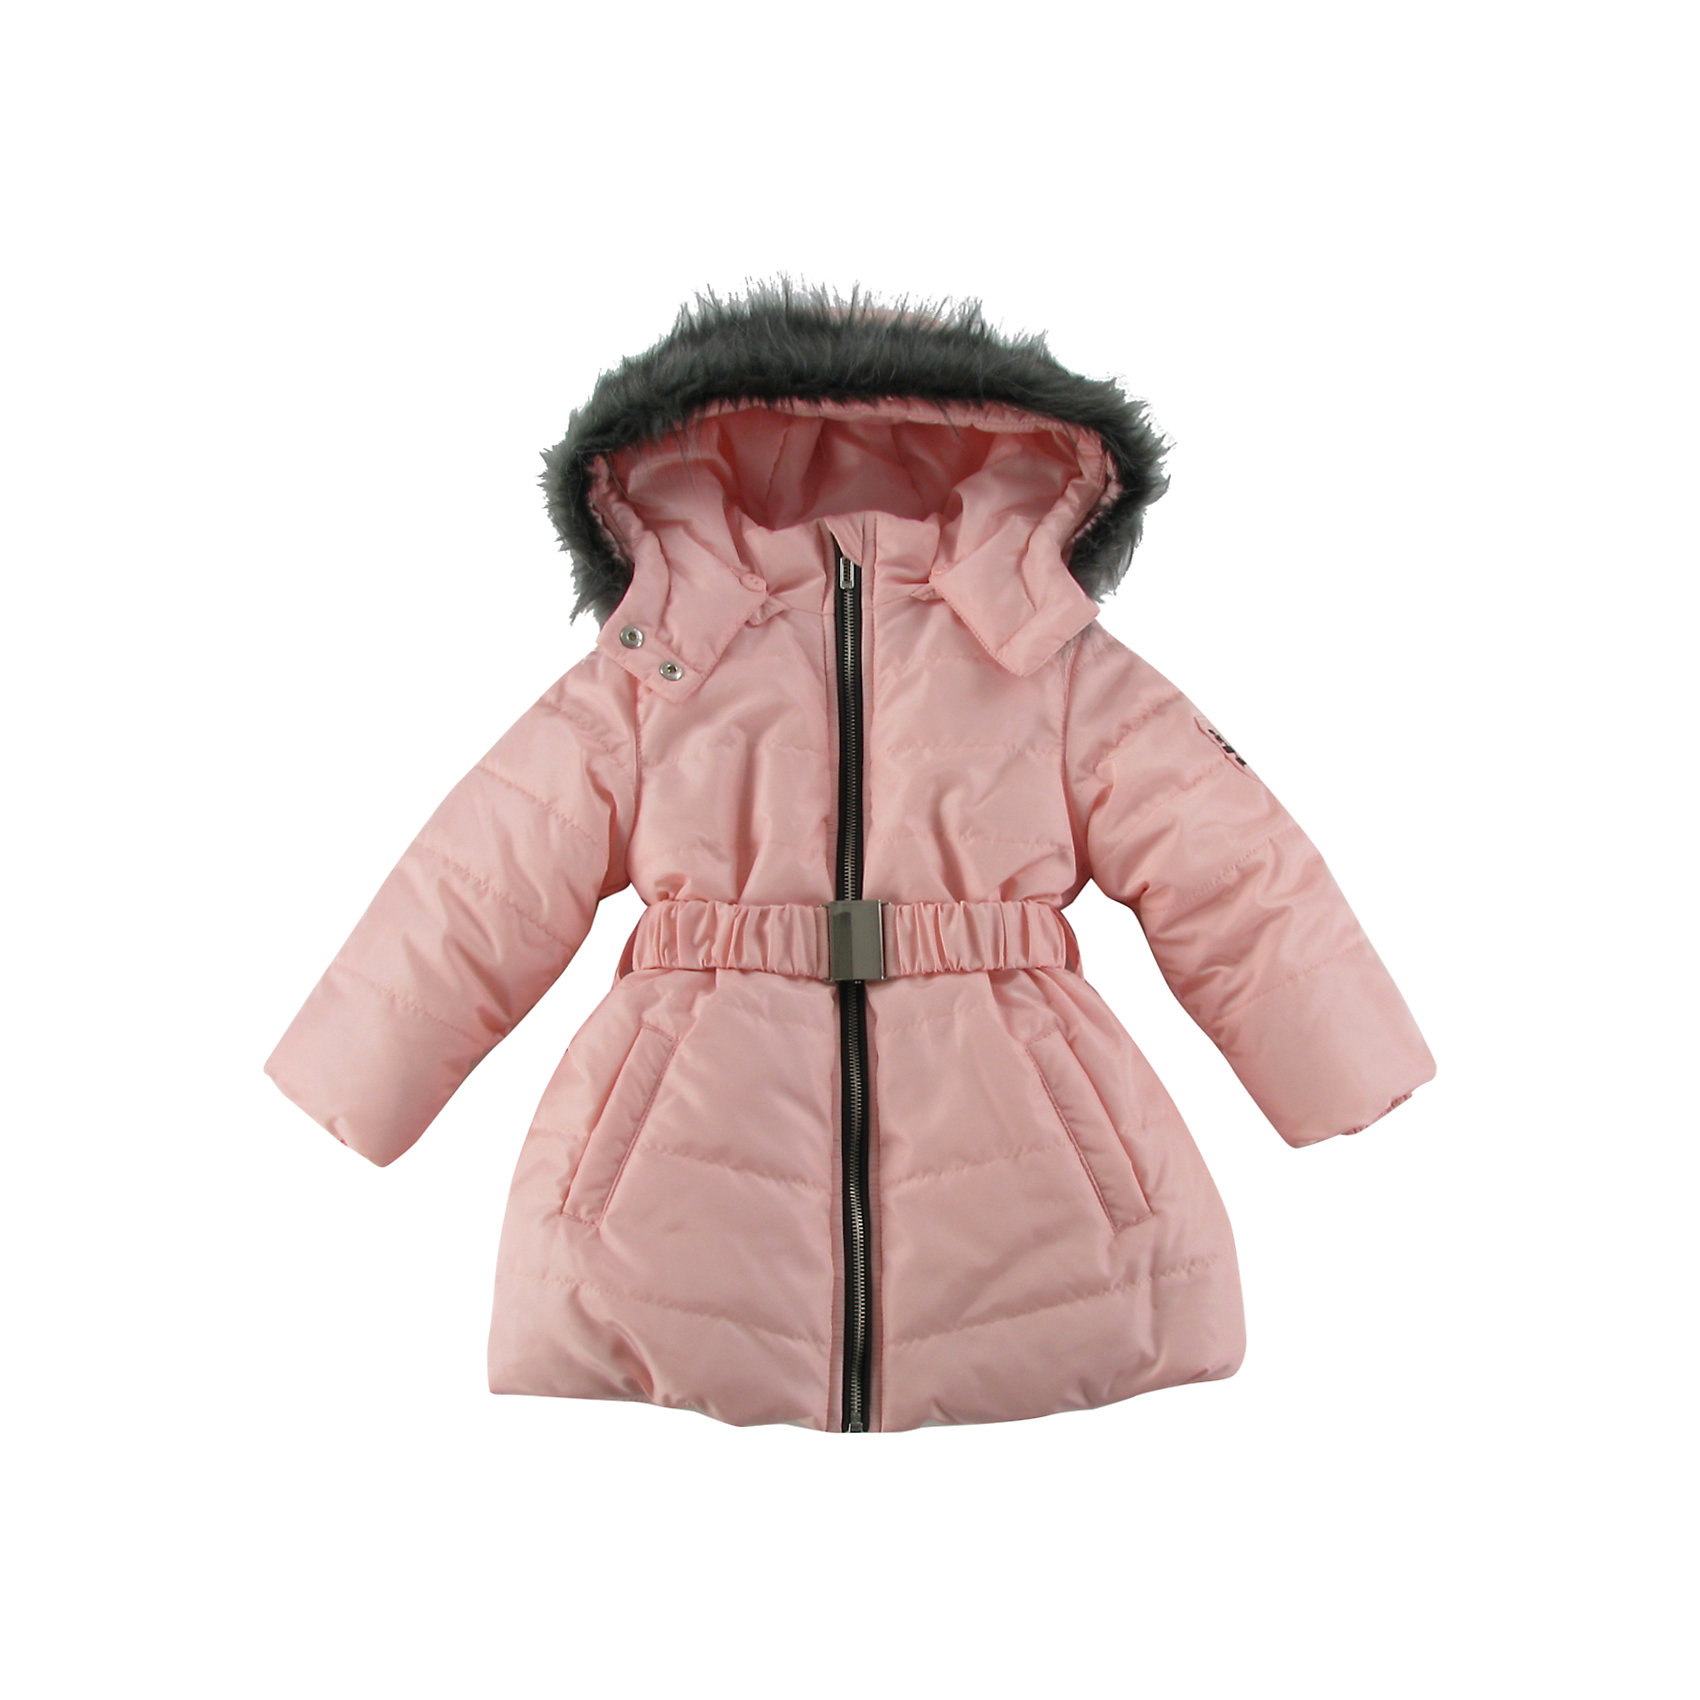 Куртка утепленная для девочки WojcikВерхняя одежда<br>Куртка утепленная для девочки Wojcik<br>Состав:<br>Полиэстер 100%<br><br>Ширина мм: 356<br>Глубина мм: 10<br>Высота мм: 245<br>Вес г: 519<br>Цвет: розовый<br>Возраст от месяцев: 96<br>Возраст до месяцев: 108<br>Пол: Женский<br>Возраст: Детский<br>Размер: 134,92,98,104,110,116,122,128<br>SKU: 5591435